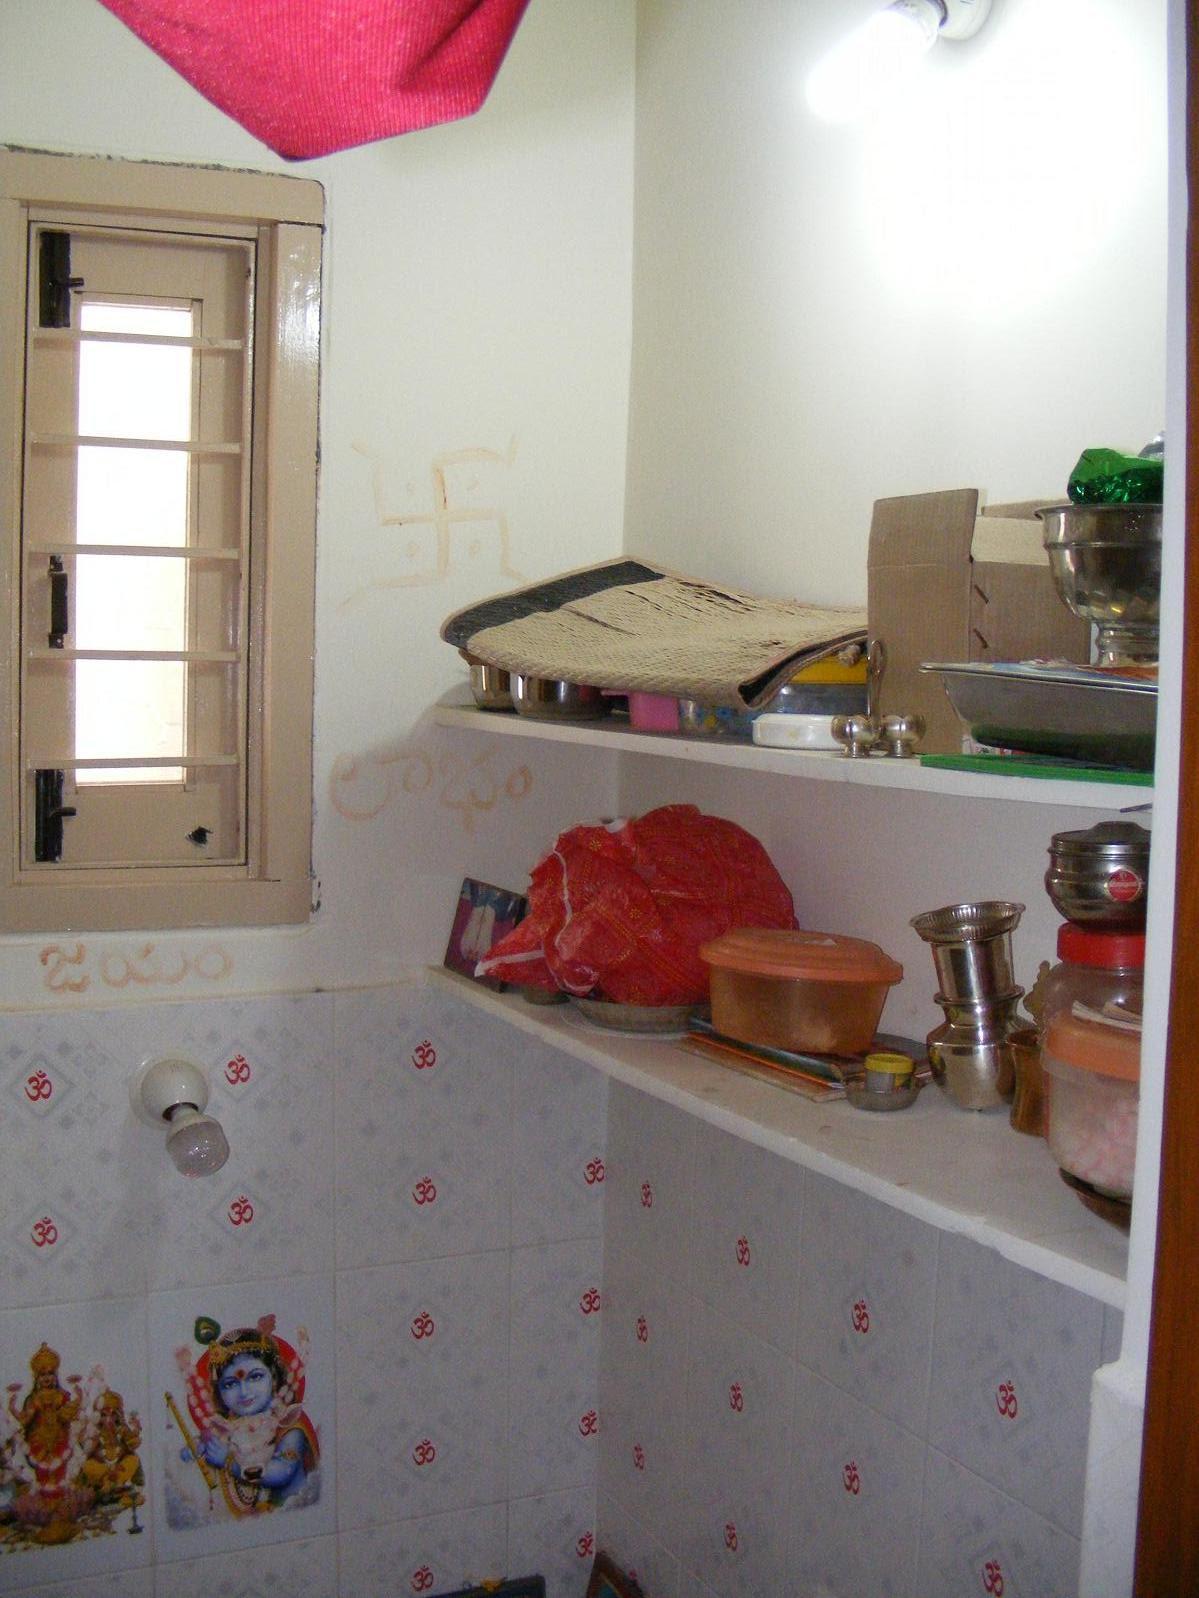 Pooja Room Floor Tiles Pictures Best House Interior Today